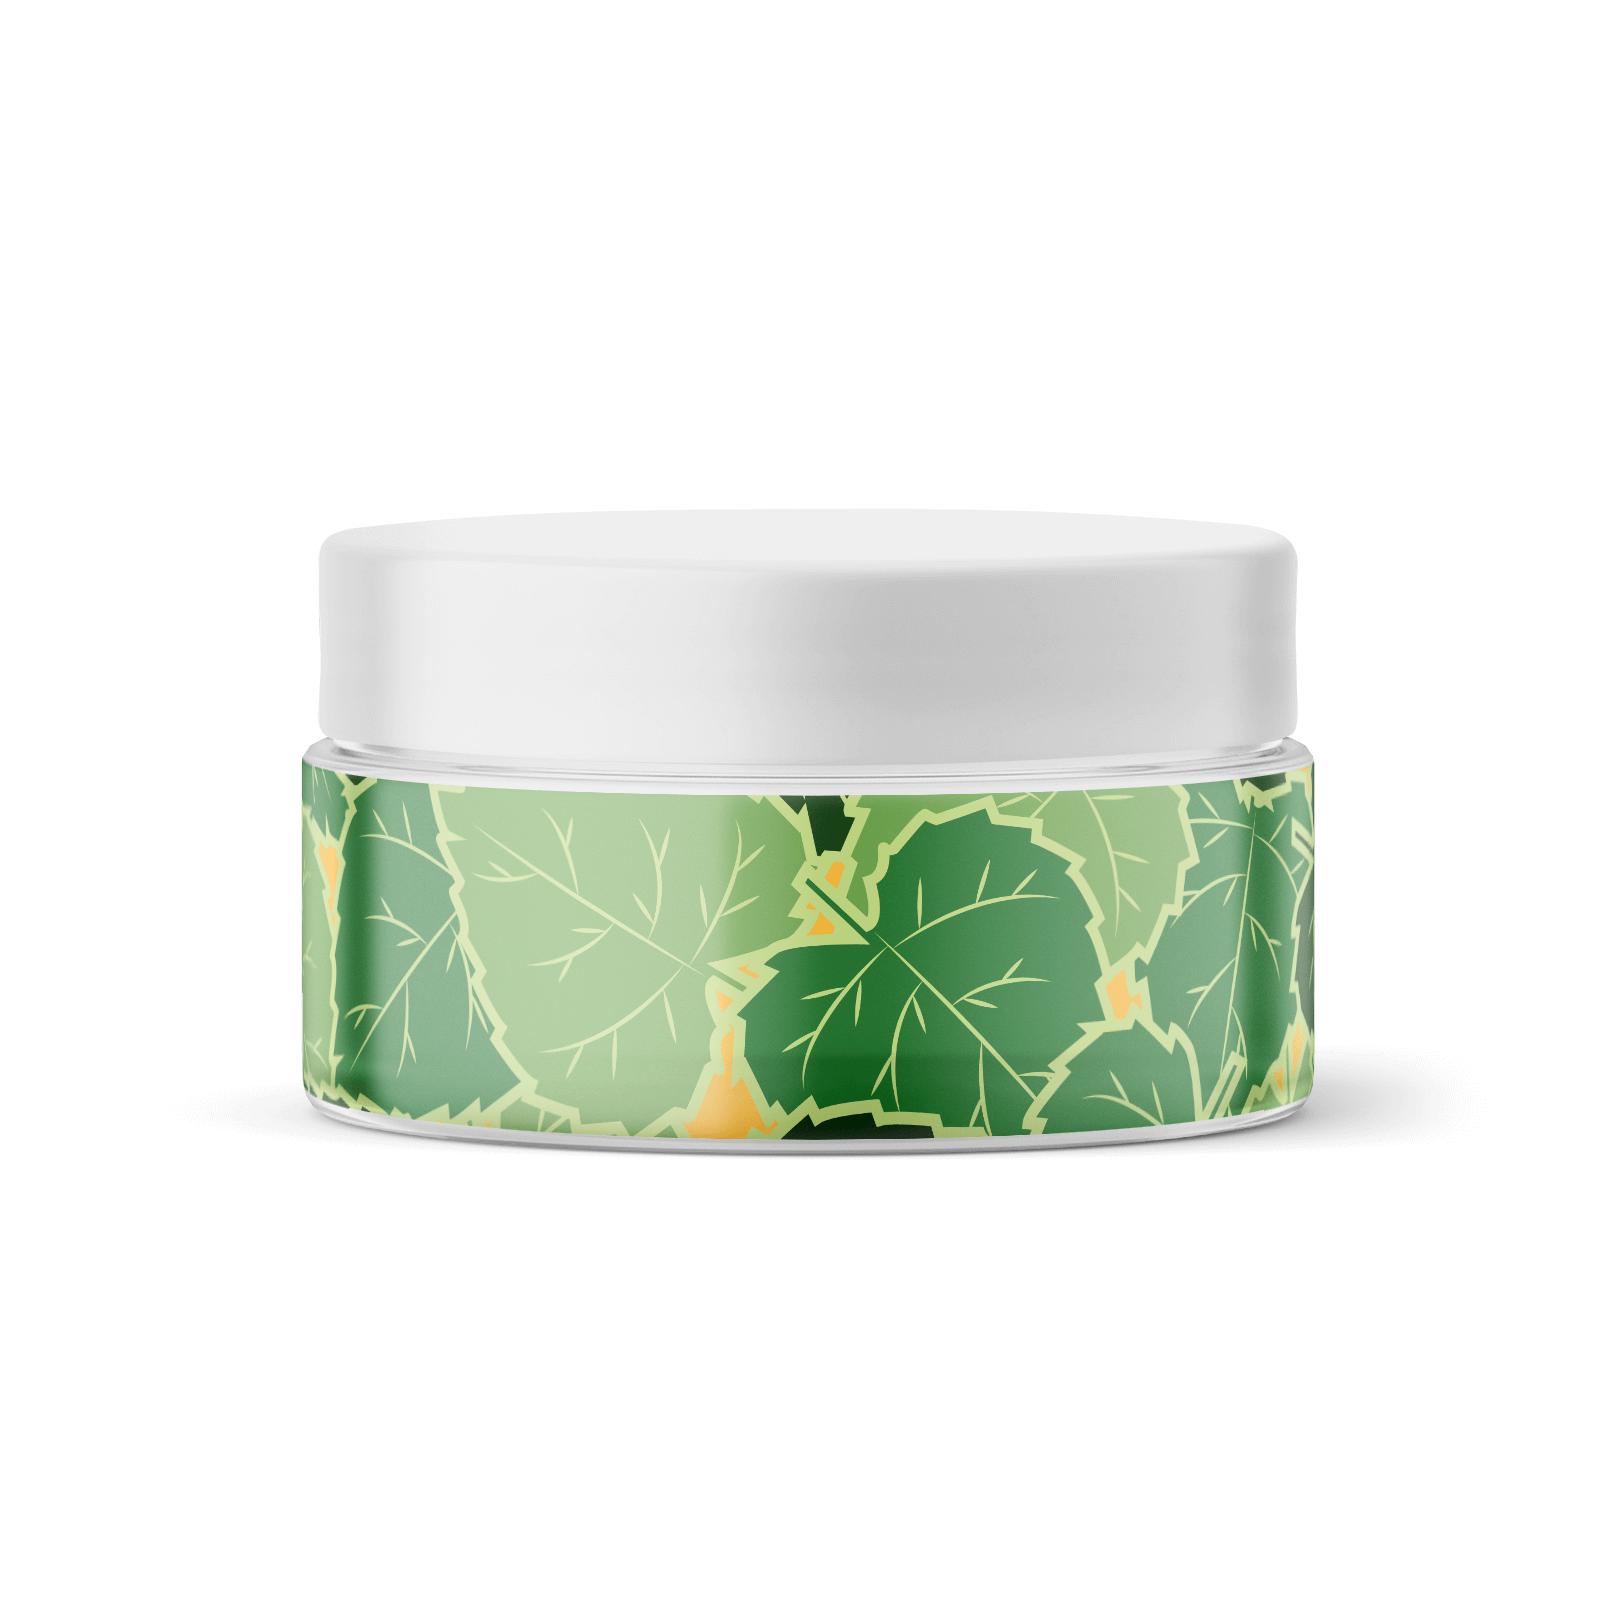 Free Comestic Jar with Lid Mockup